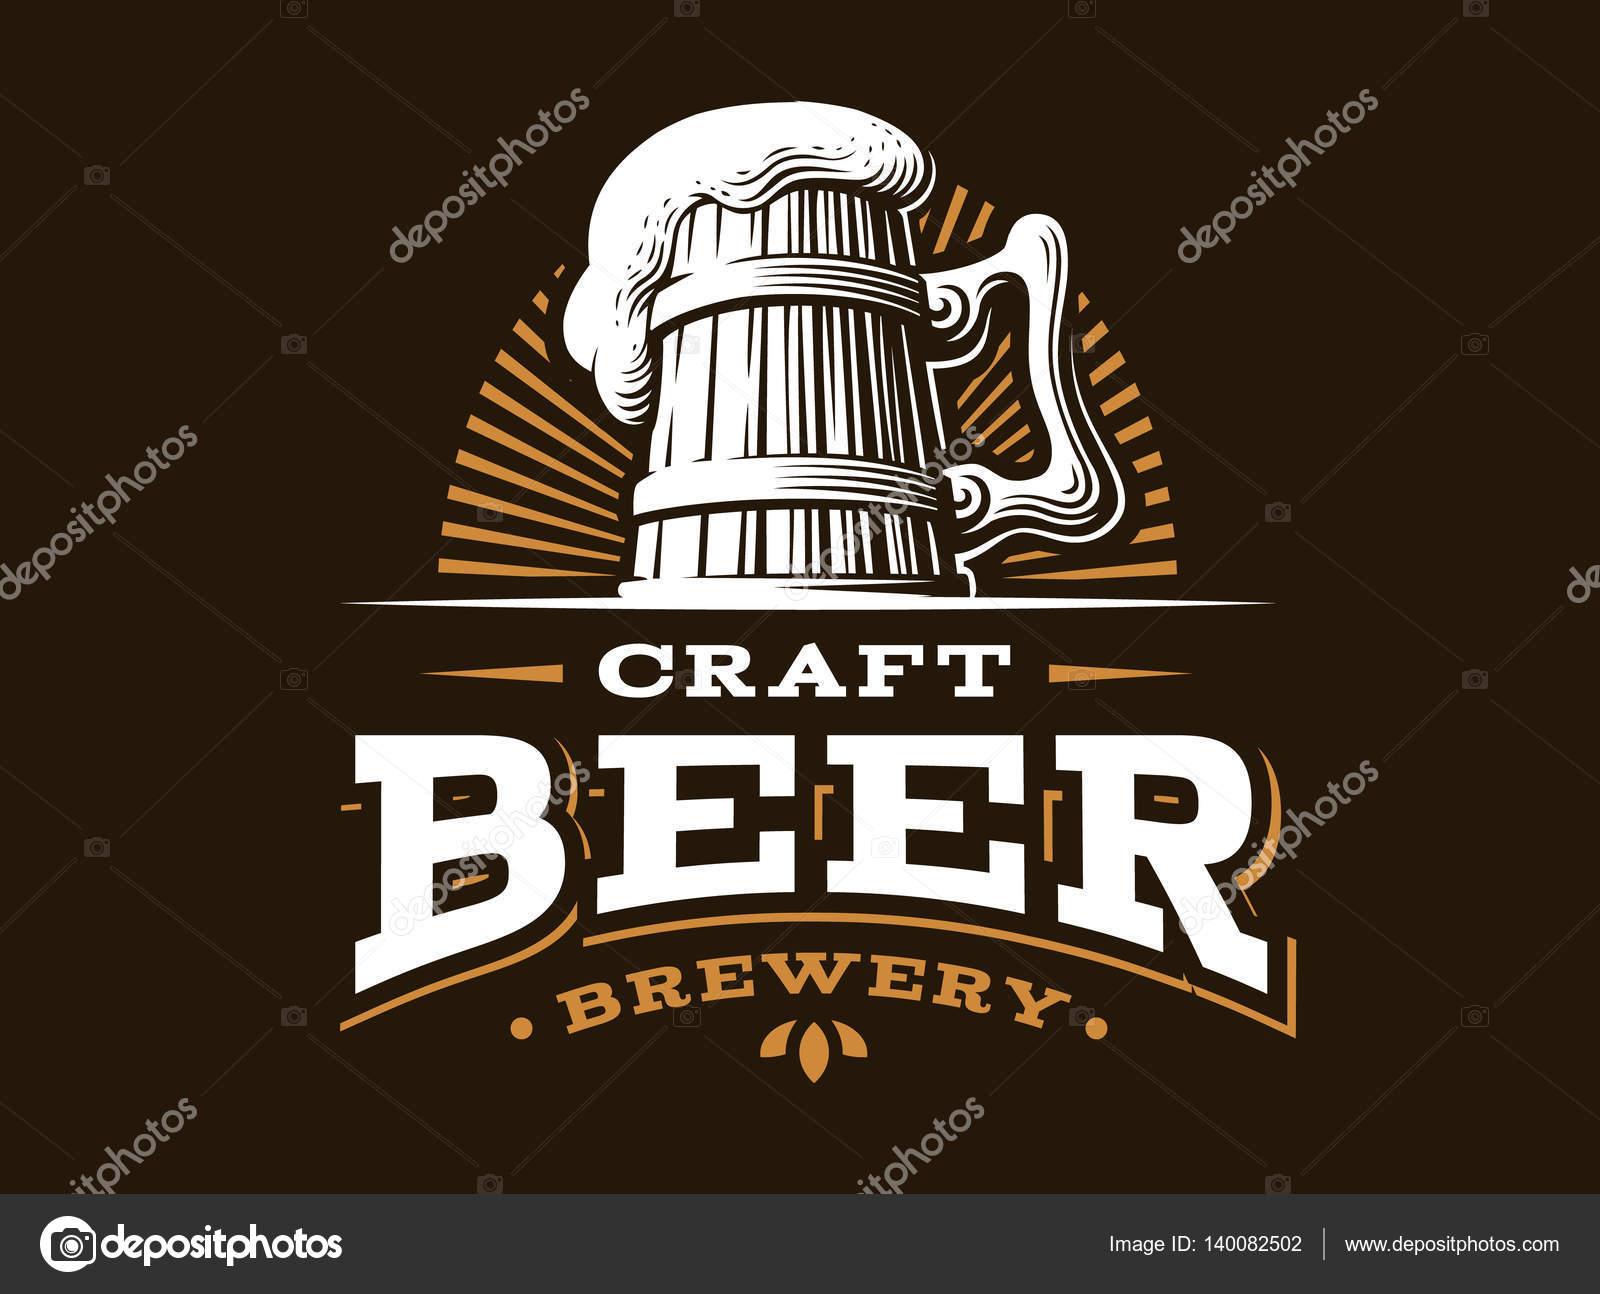 Craft Beer Logo Vector Illustration Emblem Brewery Design Stock